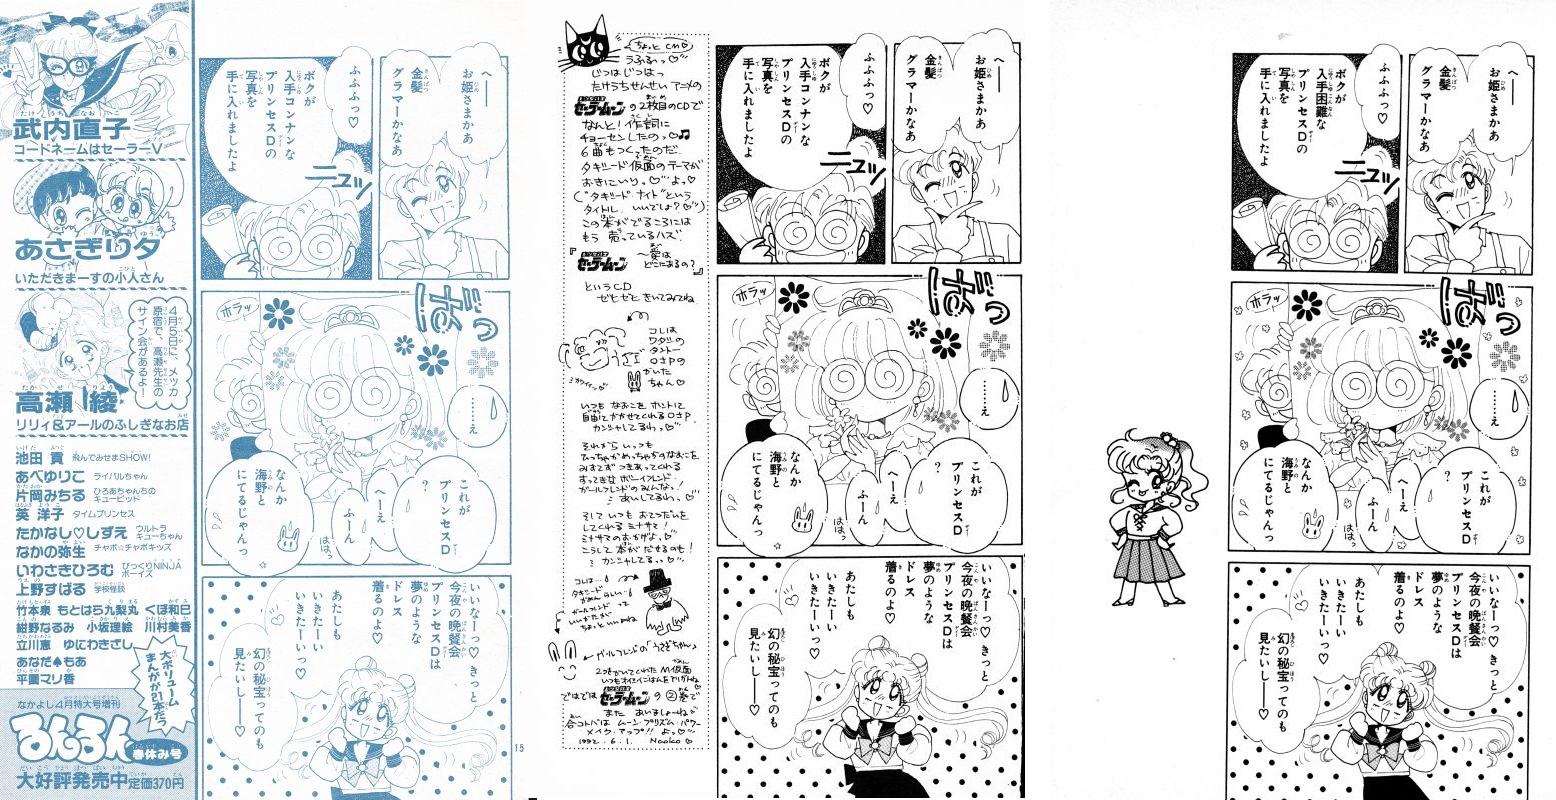 Act 4, Page 12 – Nakayoshi, Original, Remaster